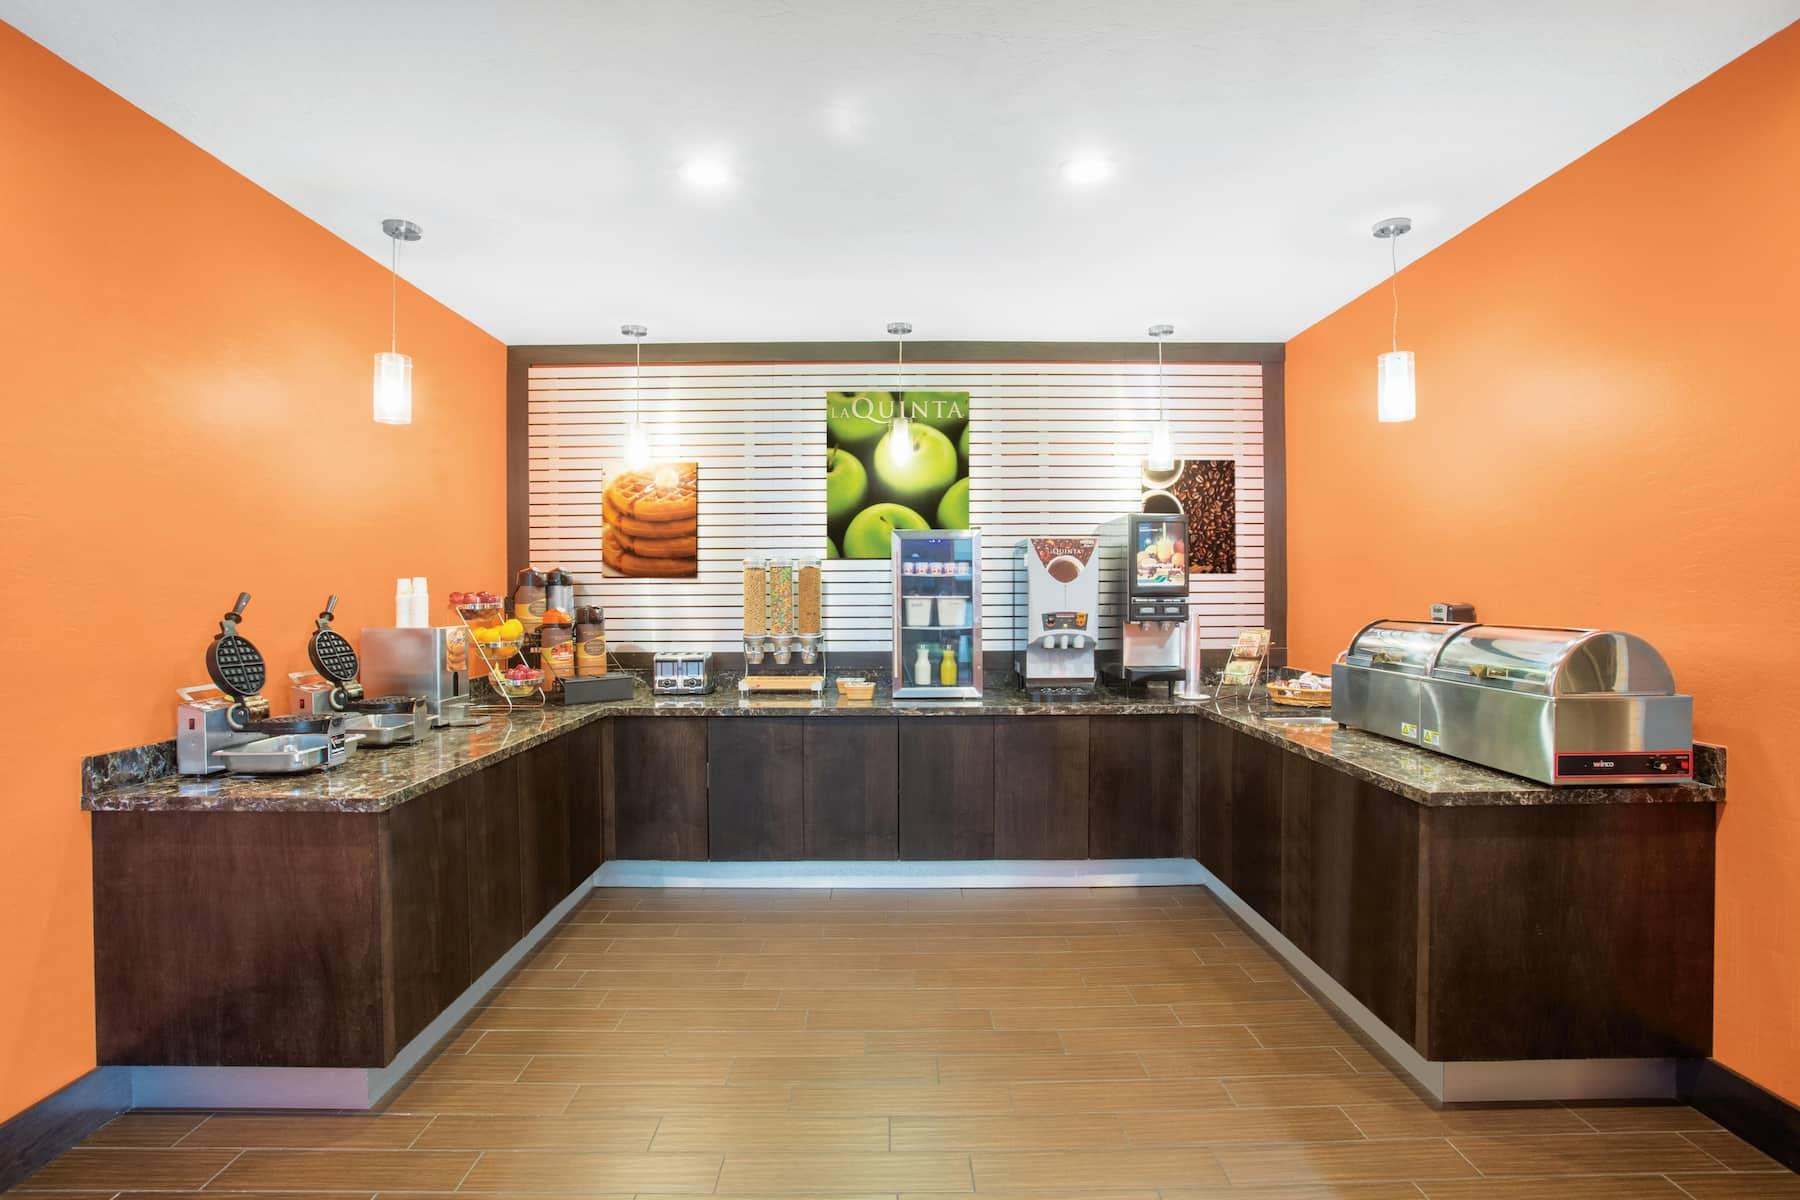 La Quinta Inn Amp Suites By Wyndham Conference Center